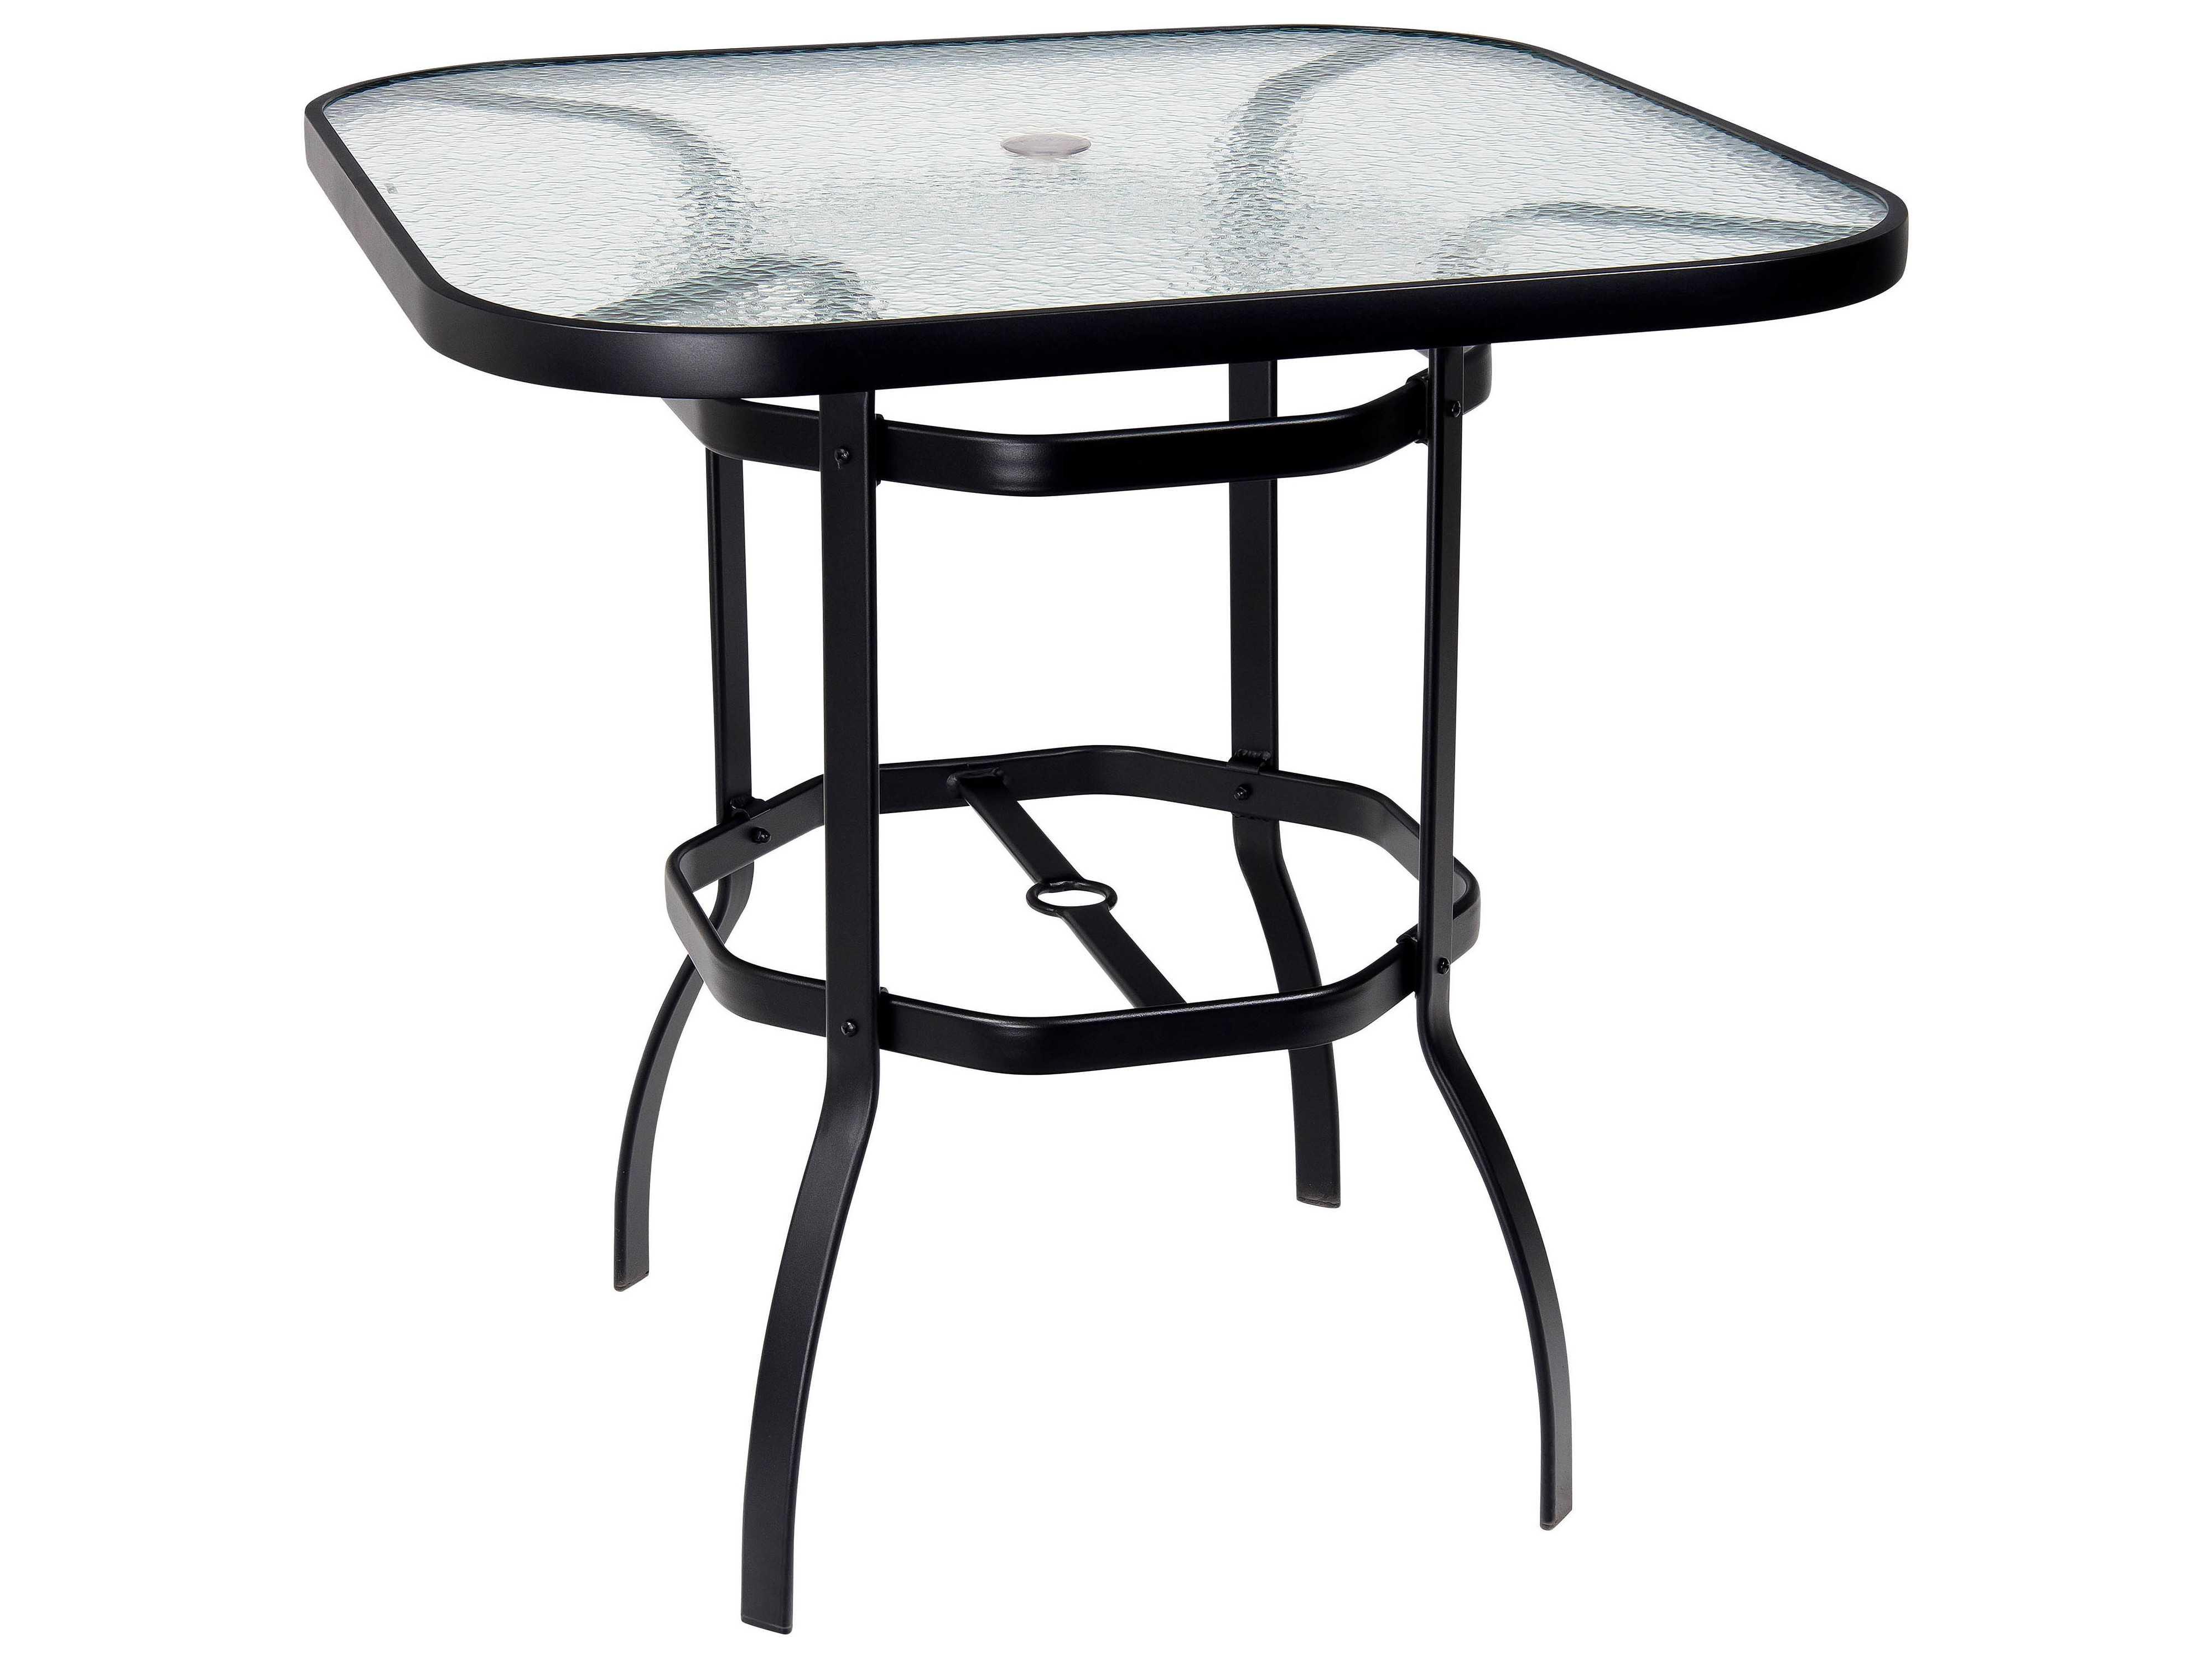 Woodard deluxe aluminum 42 square obscure glass top bar - Aluminium picnic table with umbrella ...